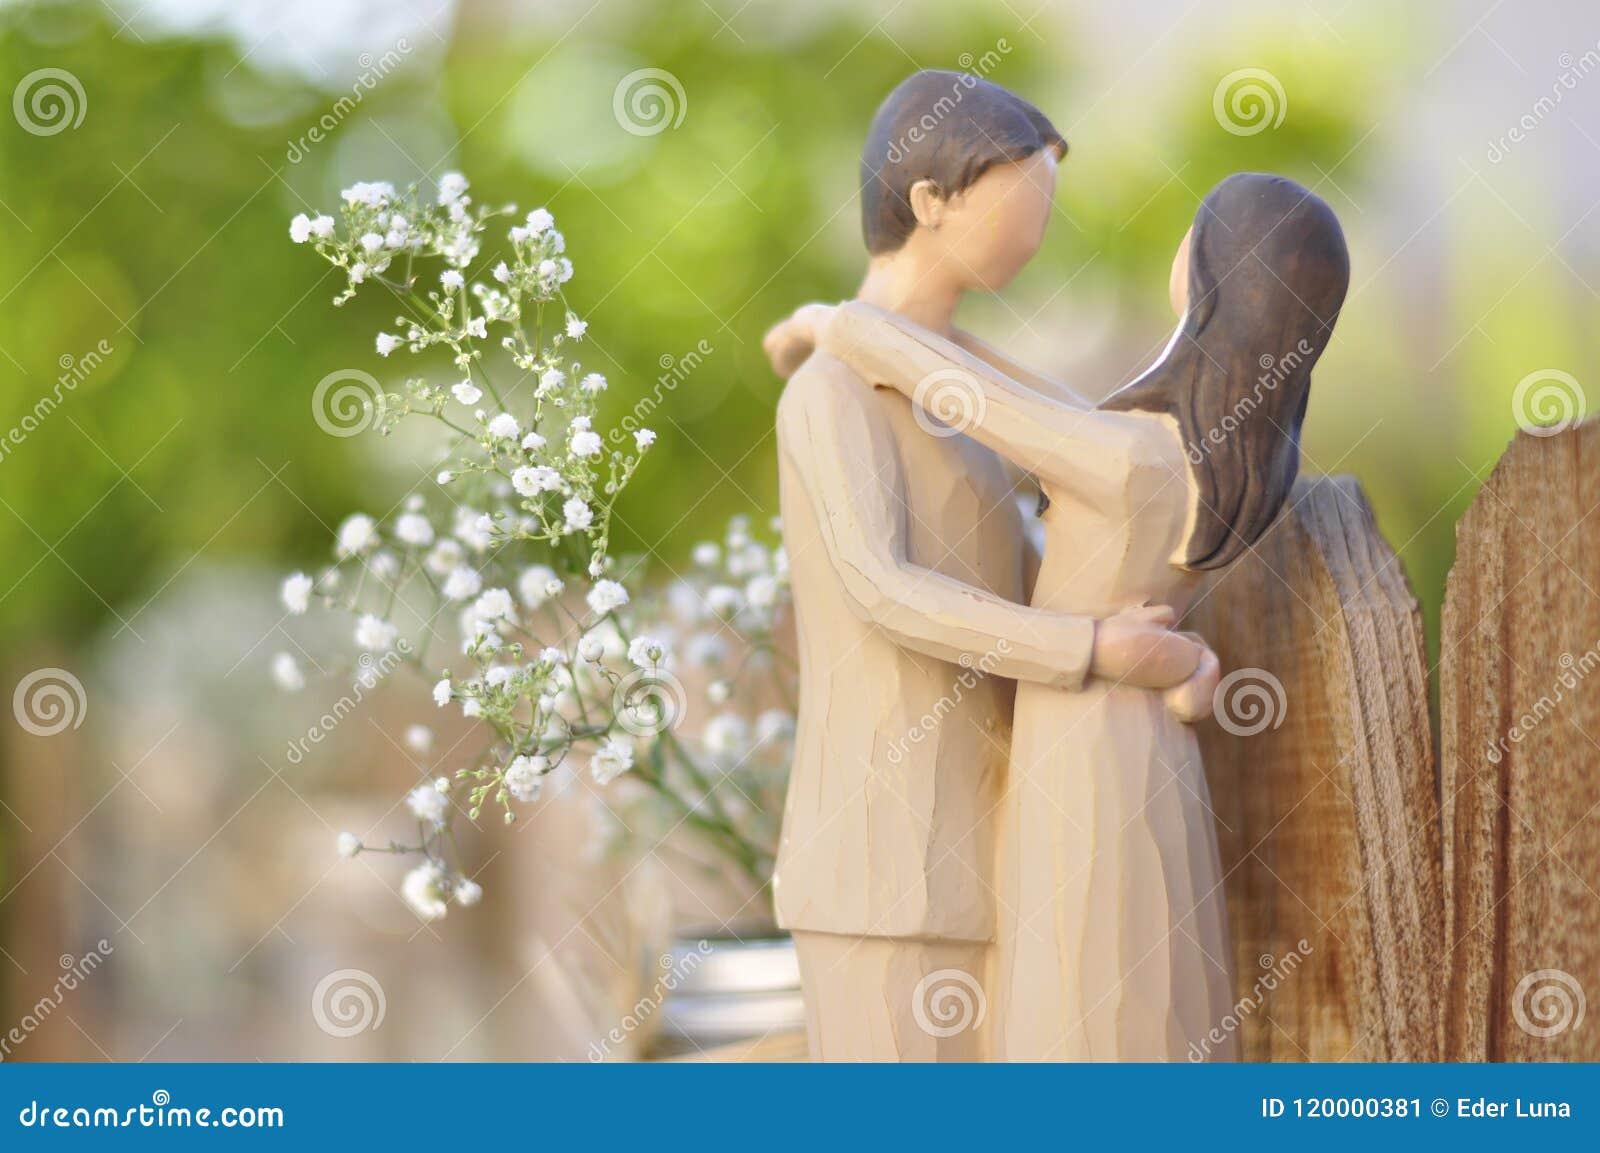 Just Married Couple Figurine Stock Image Image Of Figurines